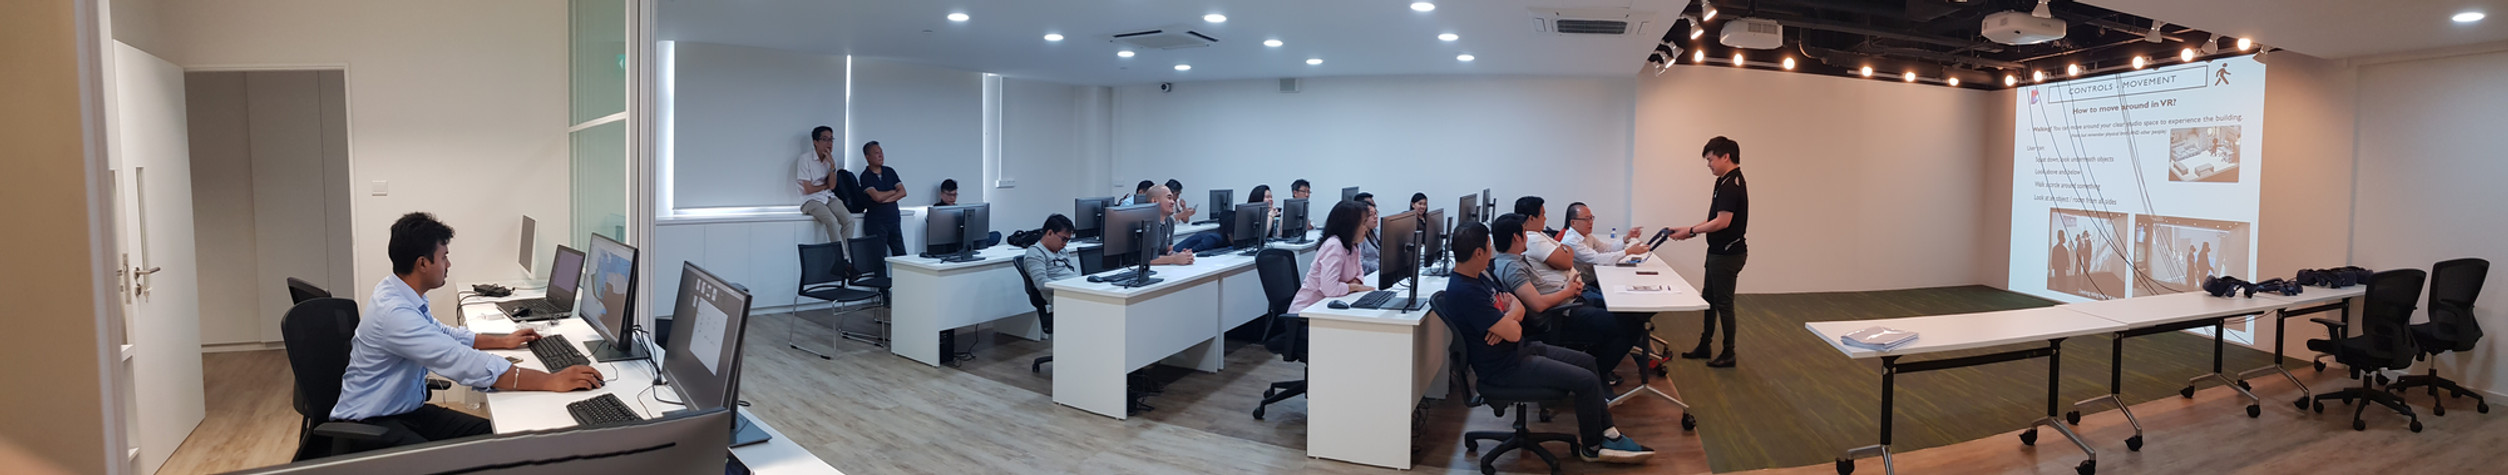 BIMatrix HQ Staff Training